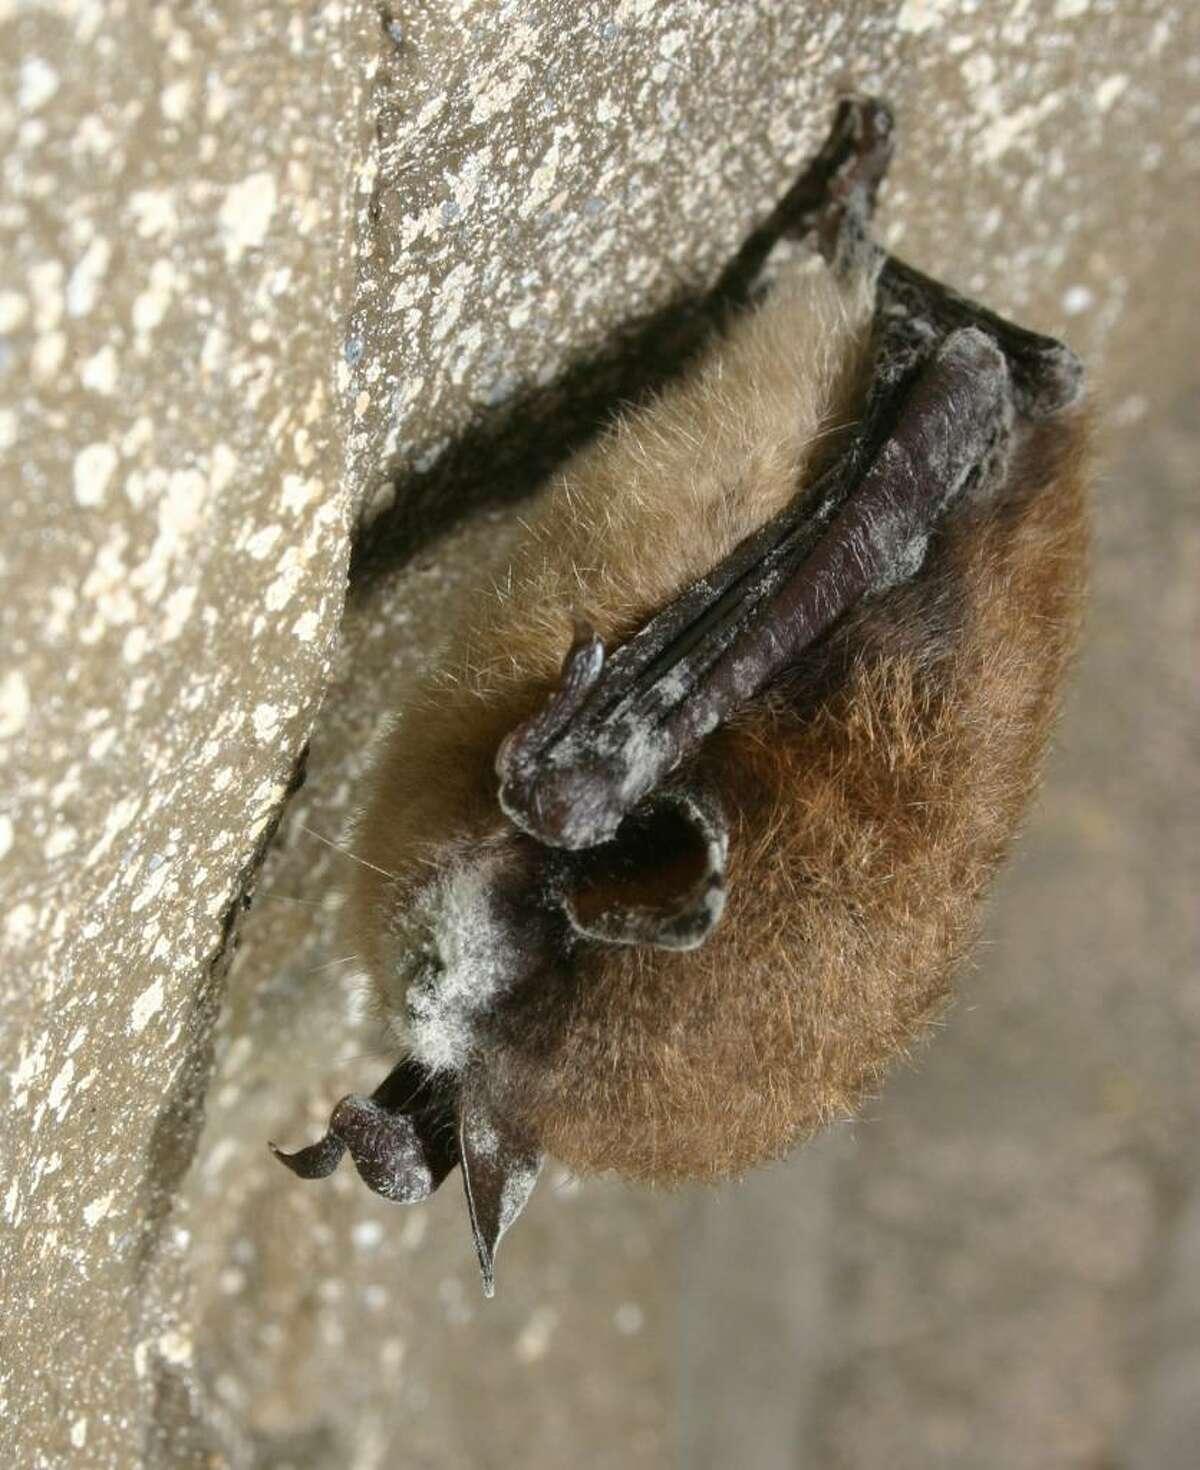 Sick bats White Nose Syndrom. (Courtesy NYS DEC)